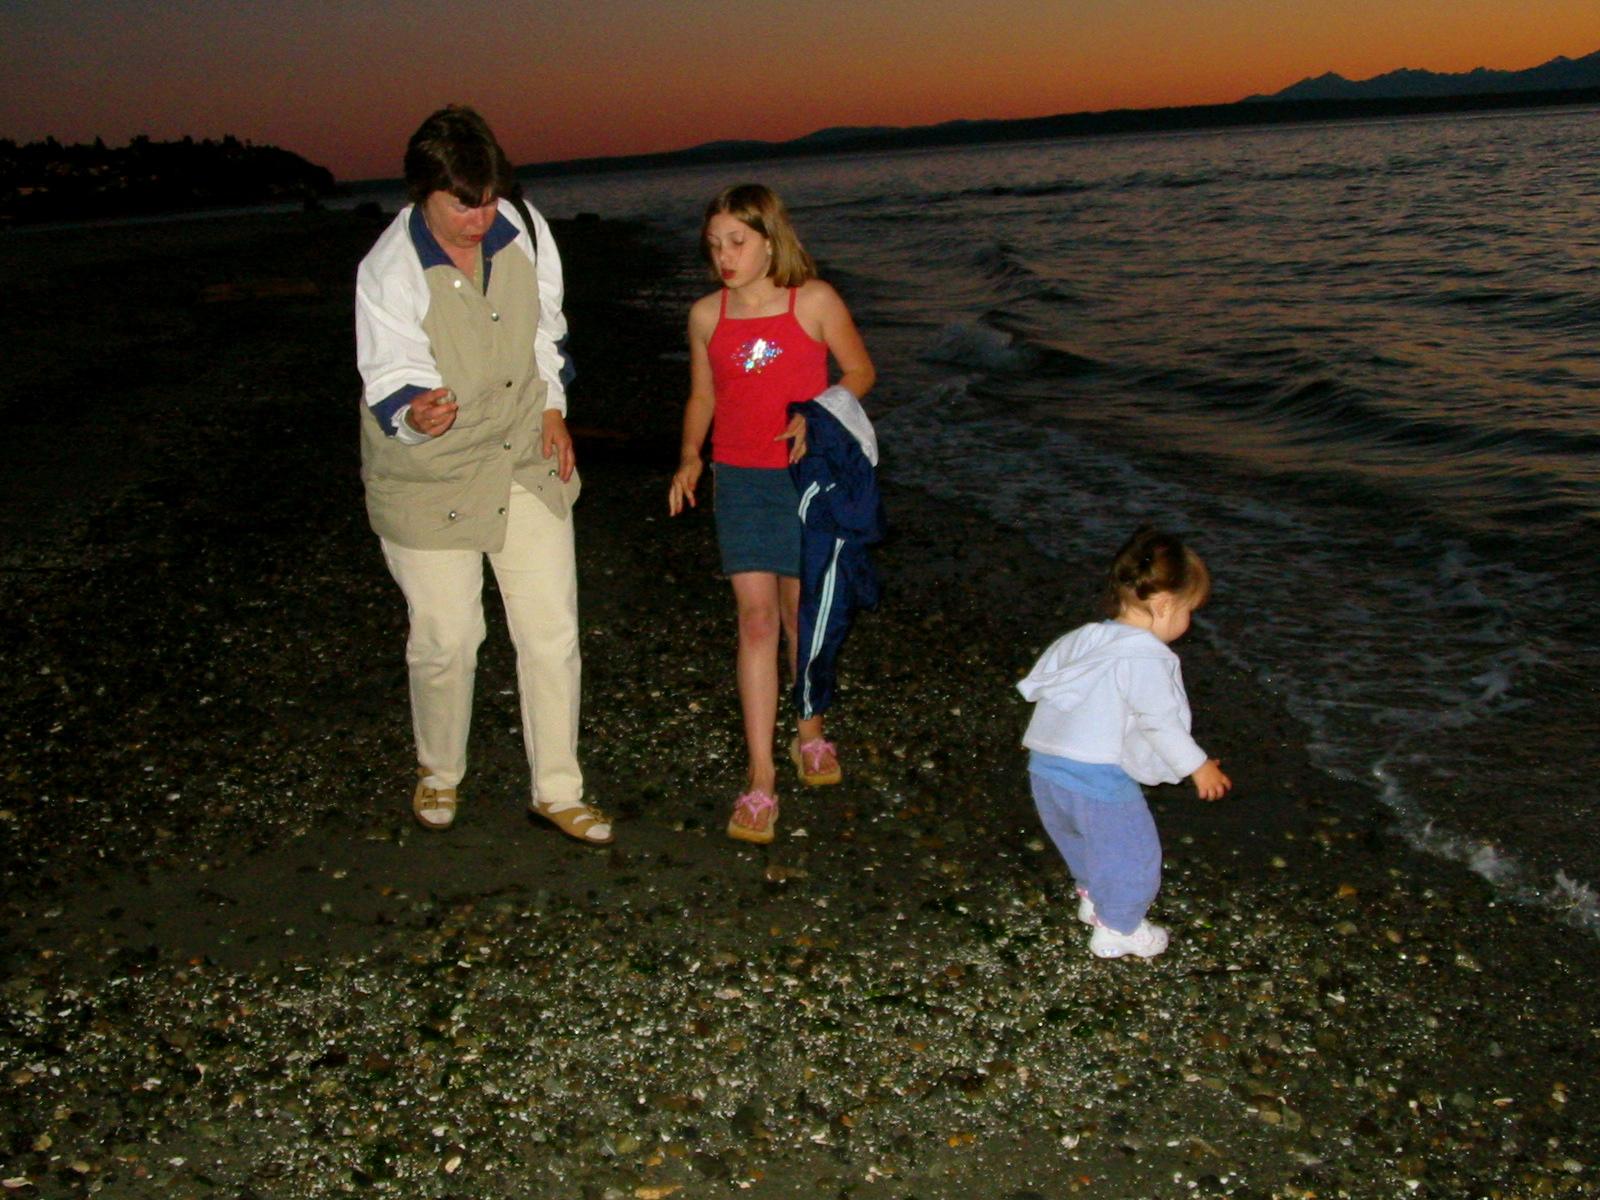 Down on the shores of Carkeek Park; L2R: Jean, Morgan, Talia, & the Salish Sea.